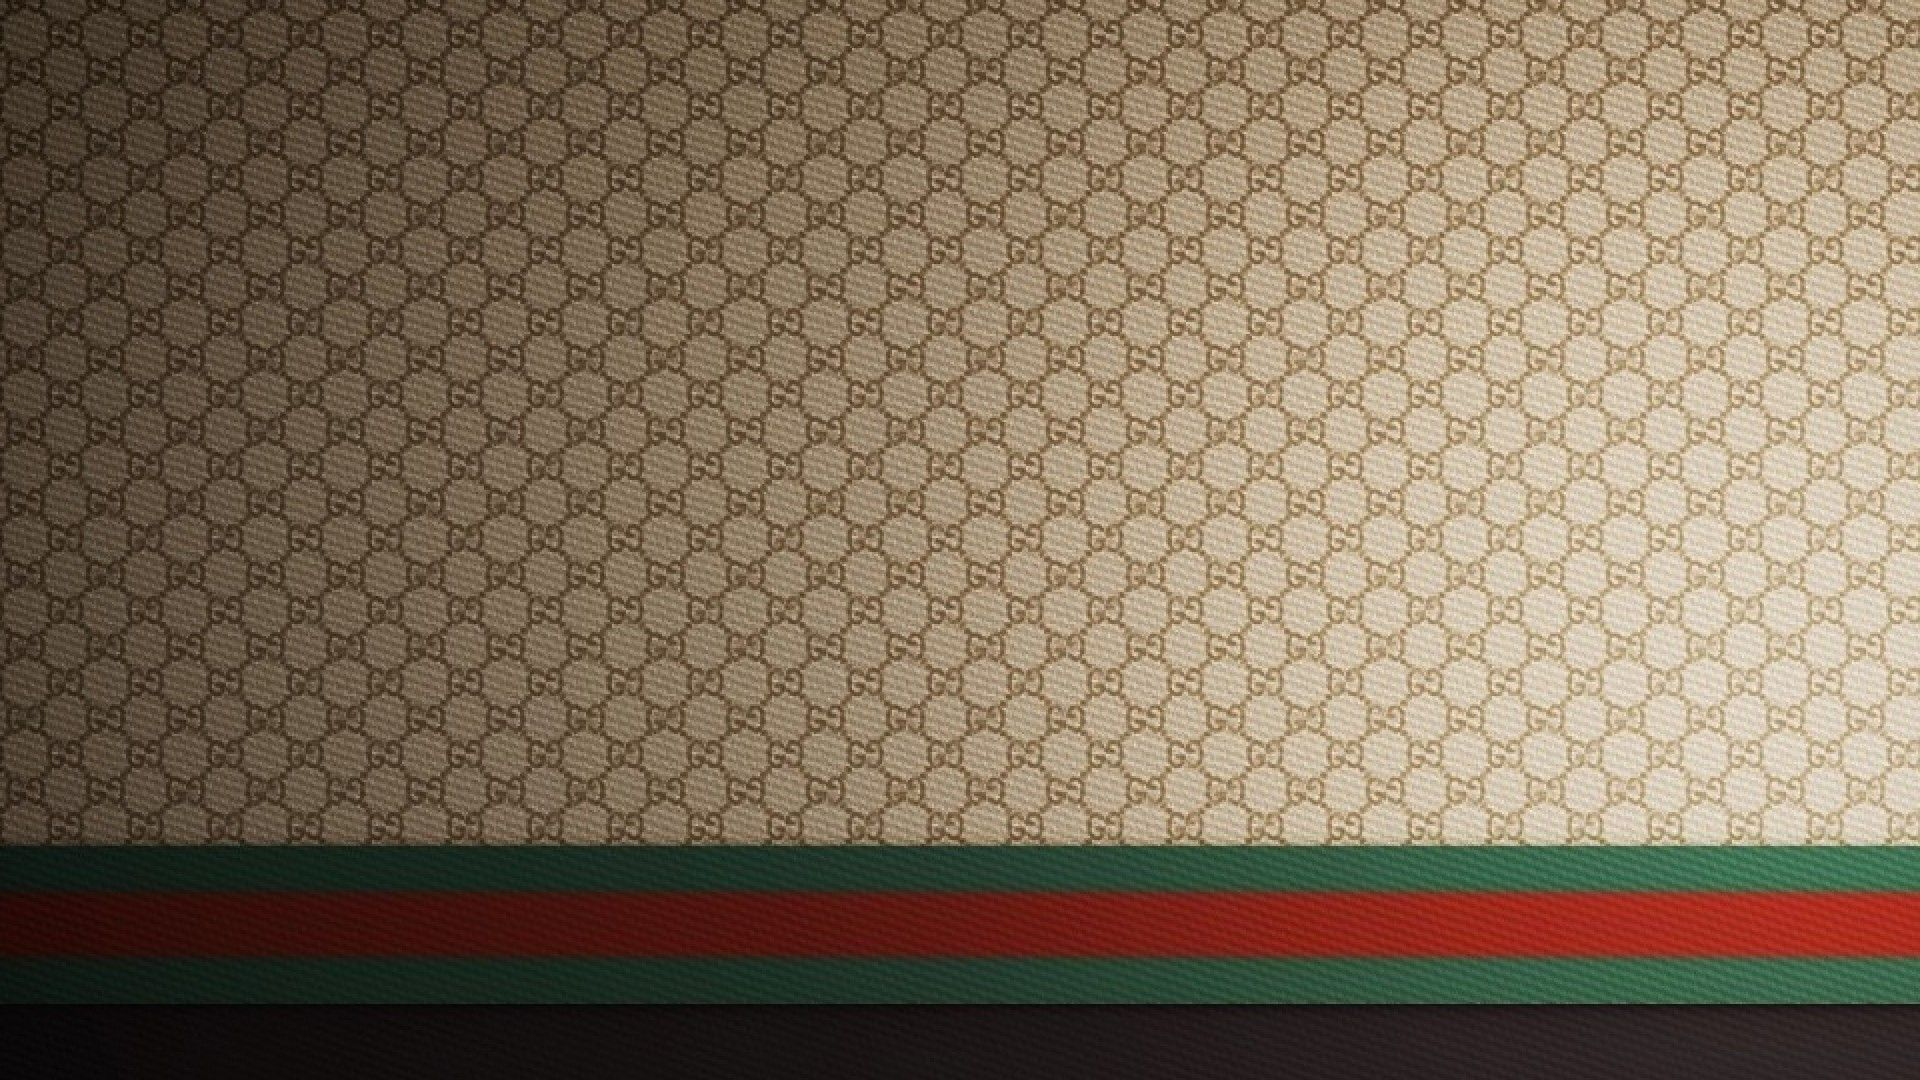 436b89fae3fa Gucci wallpapers HD free download.